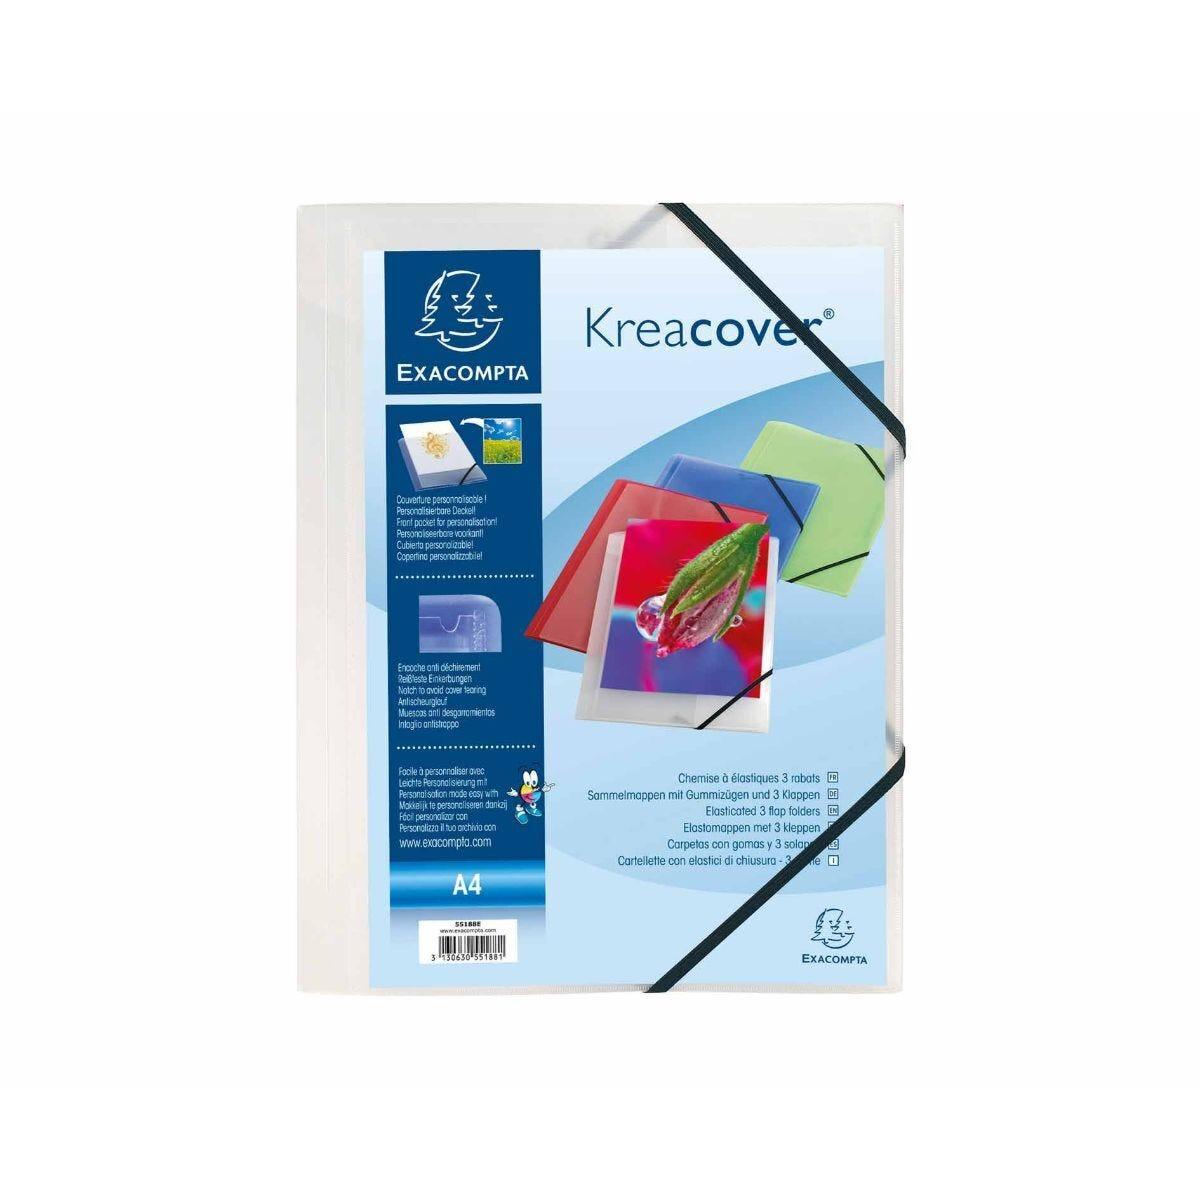 Exacompta Kreacover 3 Flap Folder A4 Pack of 25 Clear